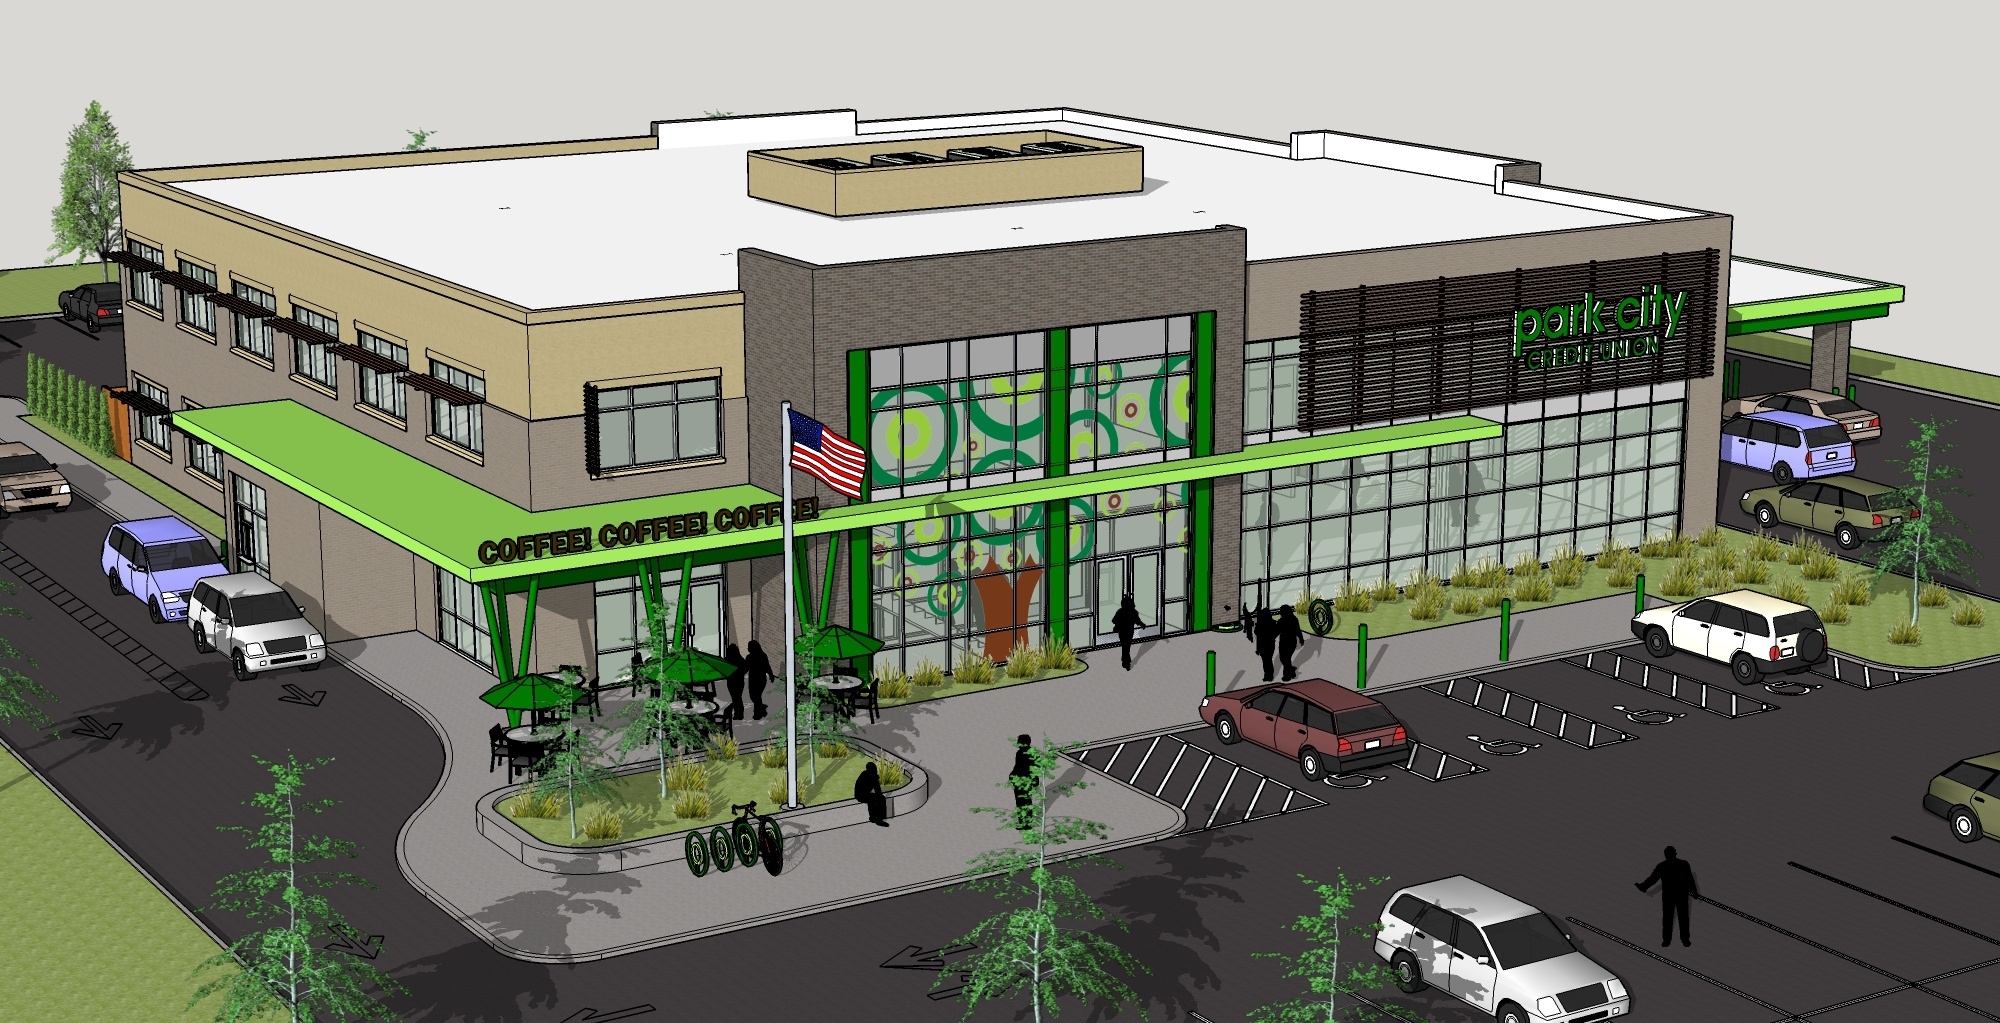 Park City Credit Union Exterior Rendering